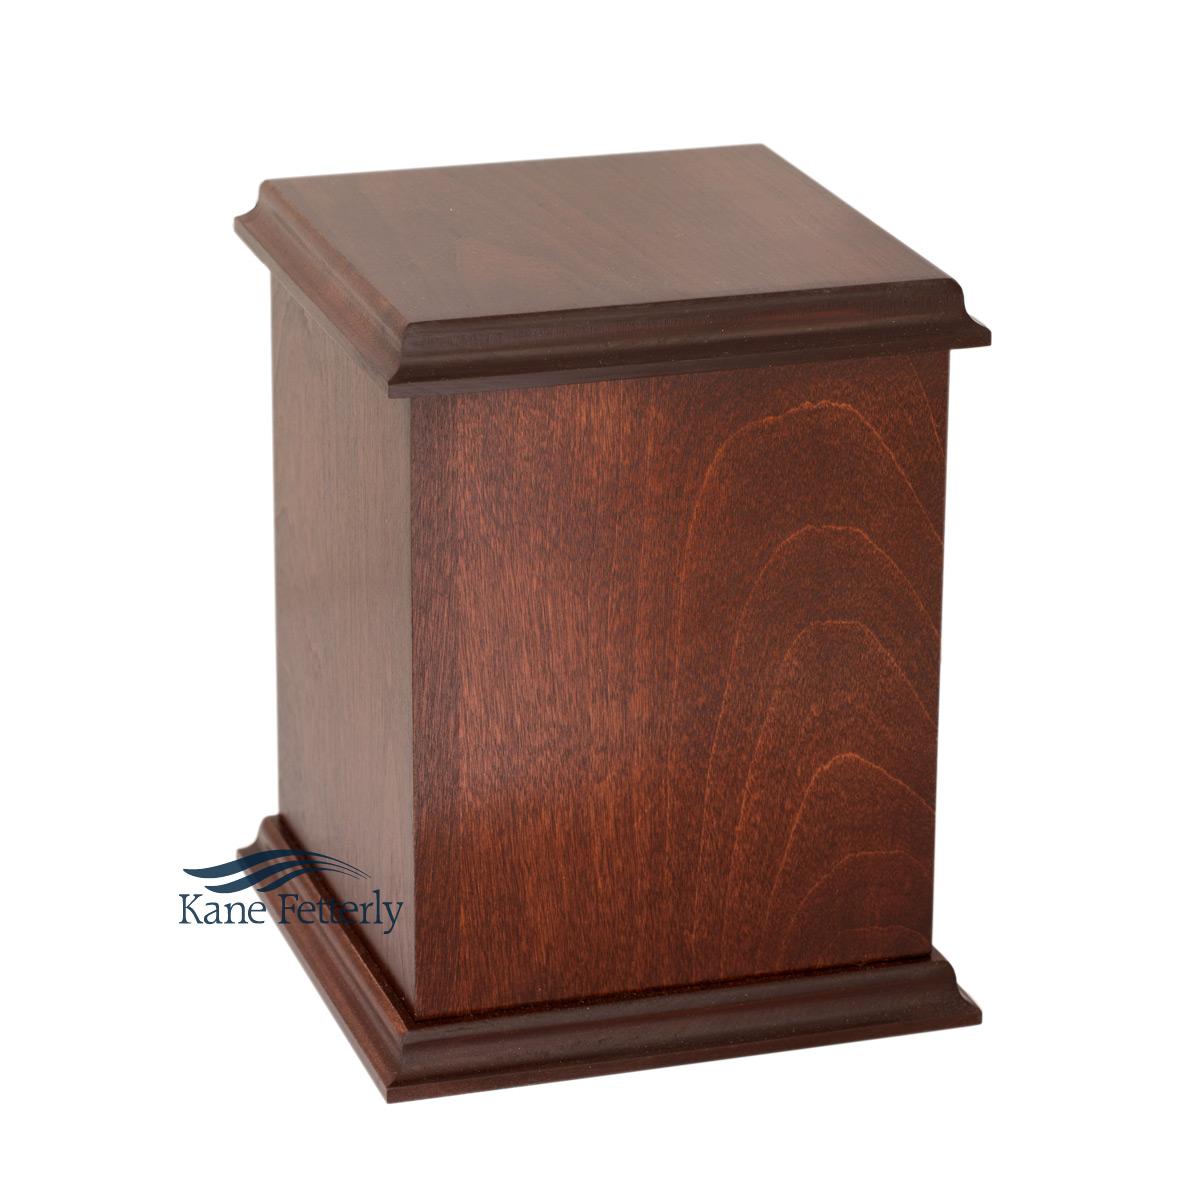 U4061 Poplar urn